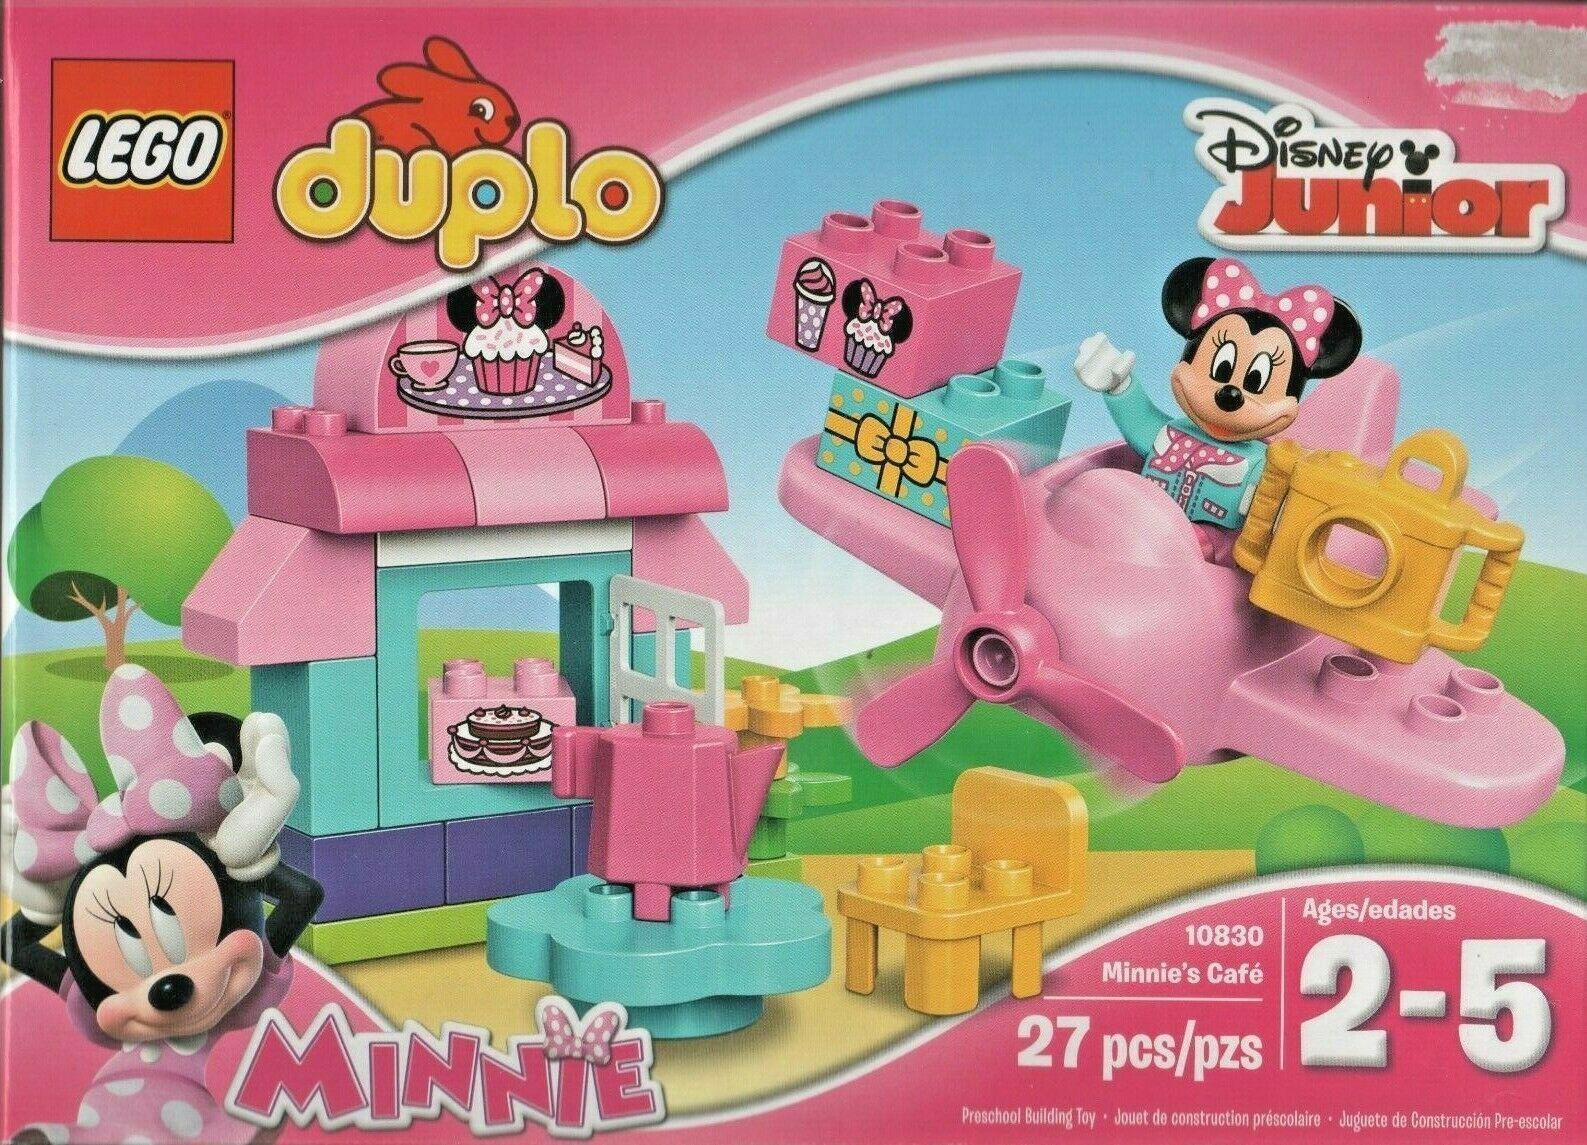 Lego Duplo Minnie Mouse Minnie S Cafe Disney Junior 10830 New No Canadian Duties Ebay Minnie Mouse Toys Lego Duplo Preschool Toys